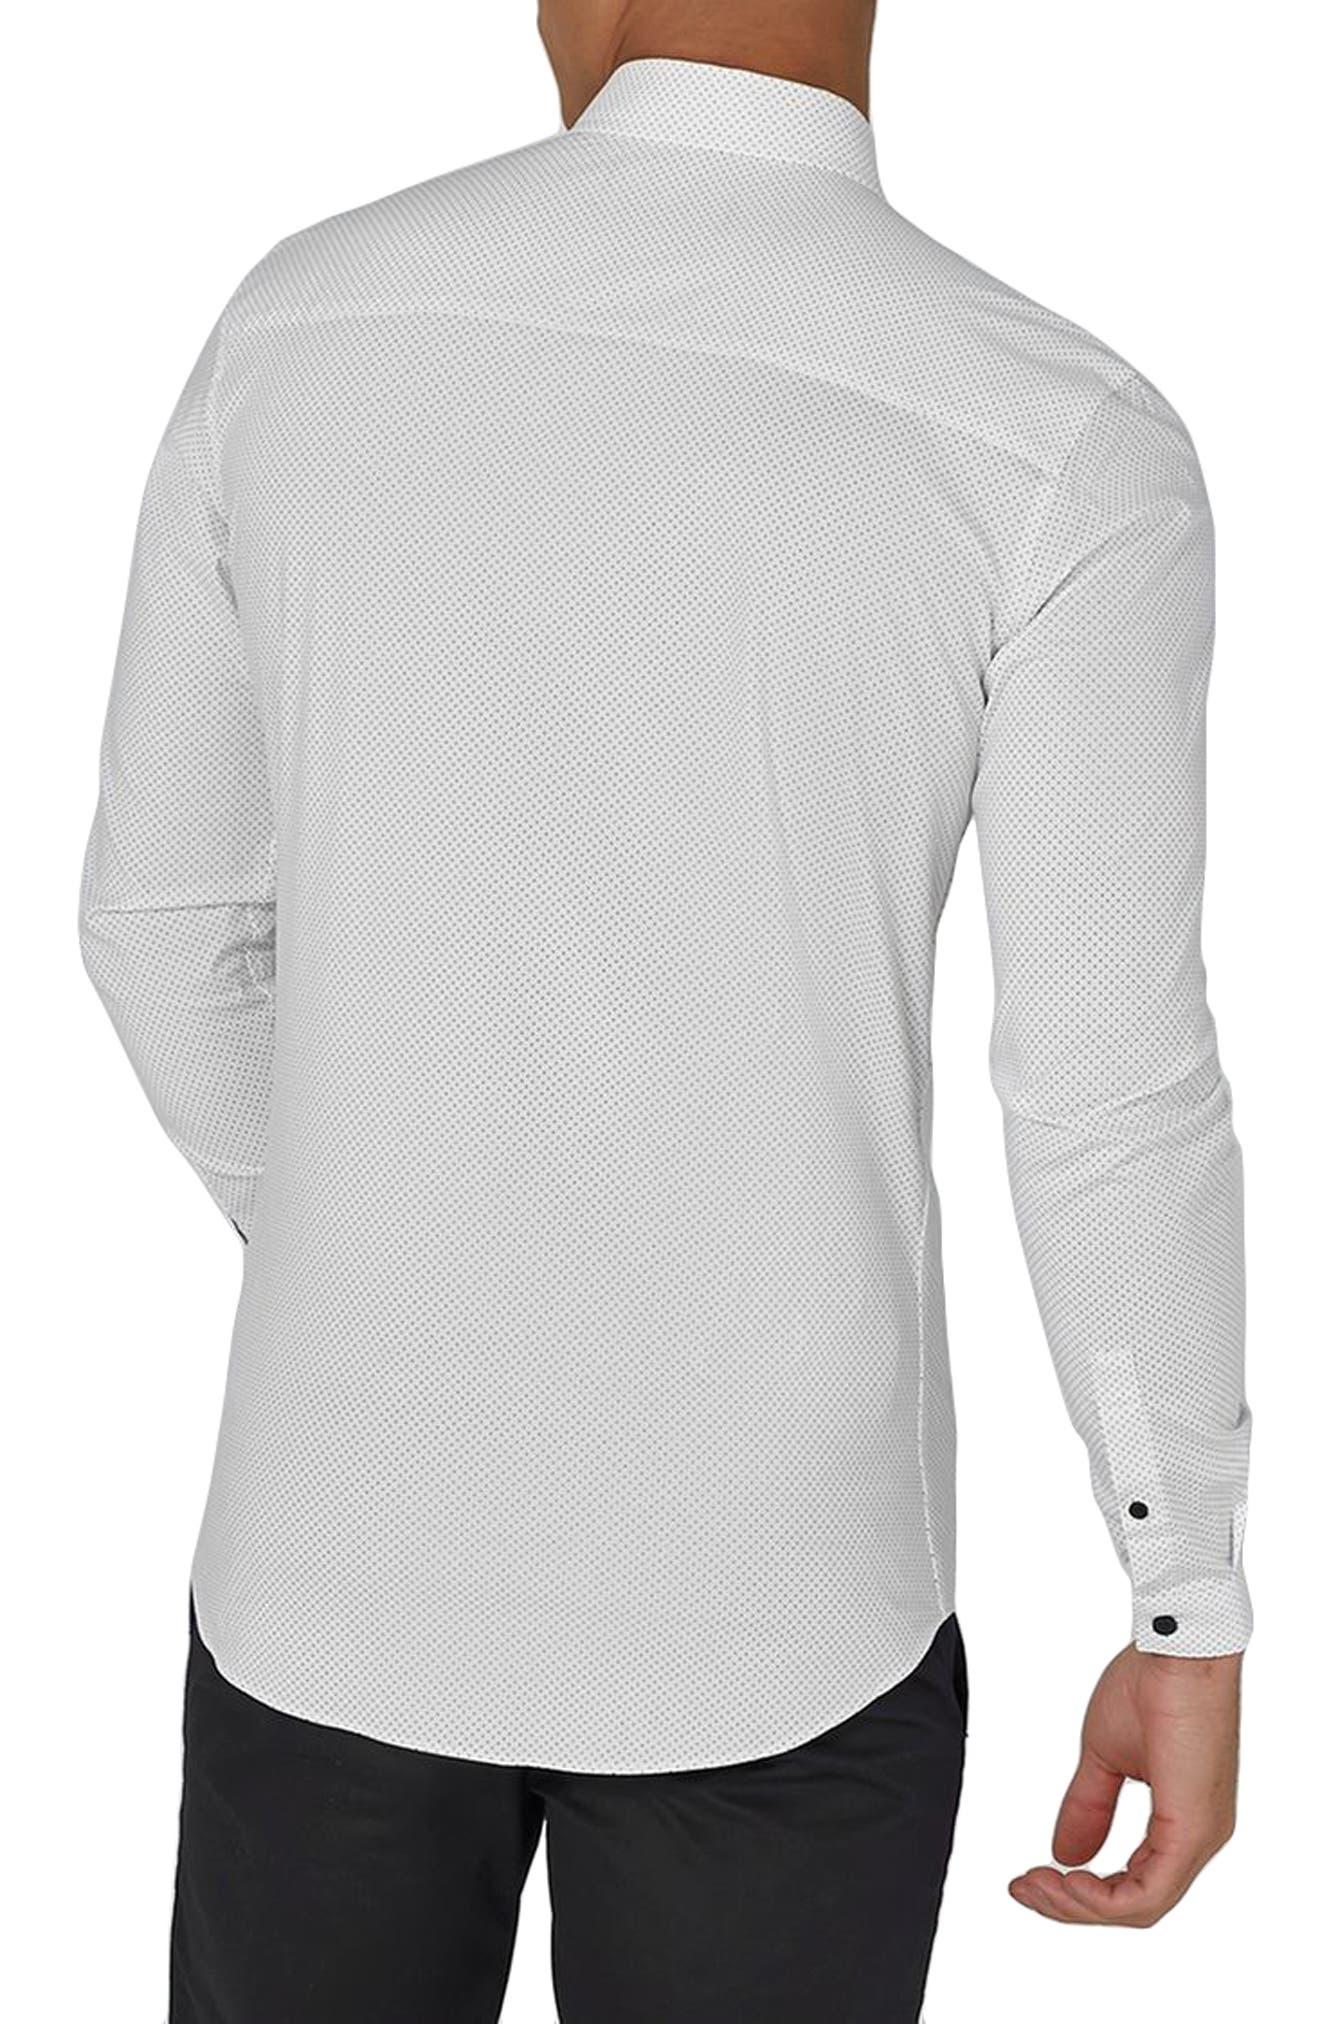 Muscle Fit Polka Dot Sport Shirt,                             Alternate thumbnail 2, color,                             White Multi